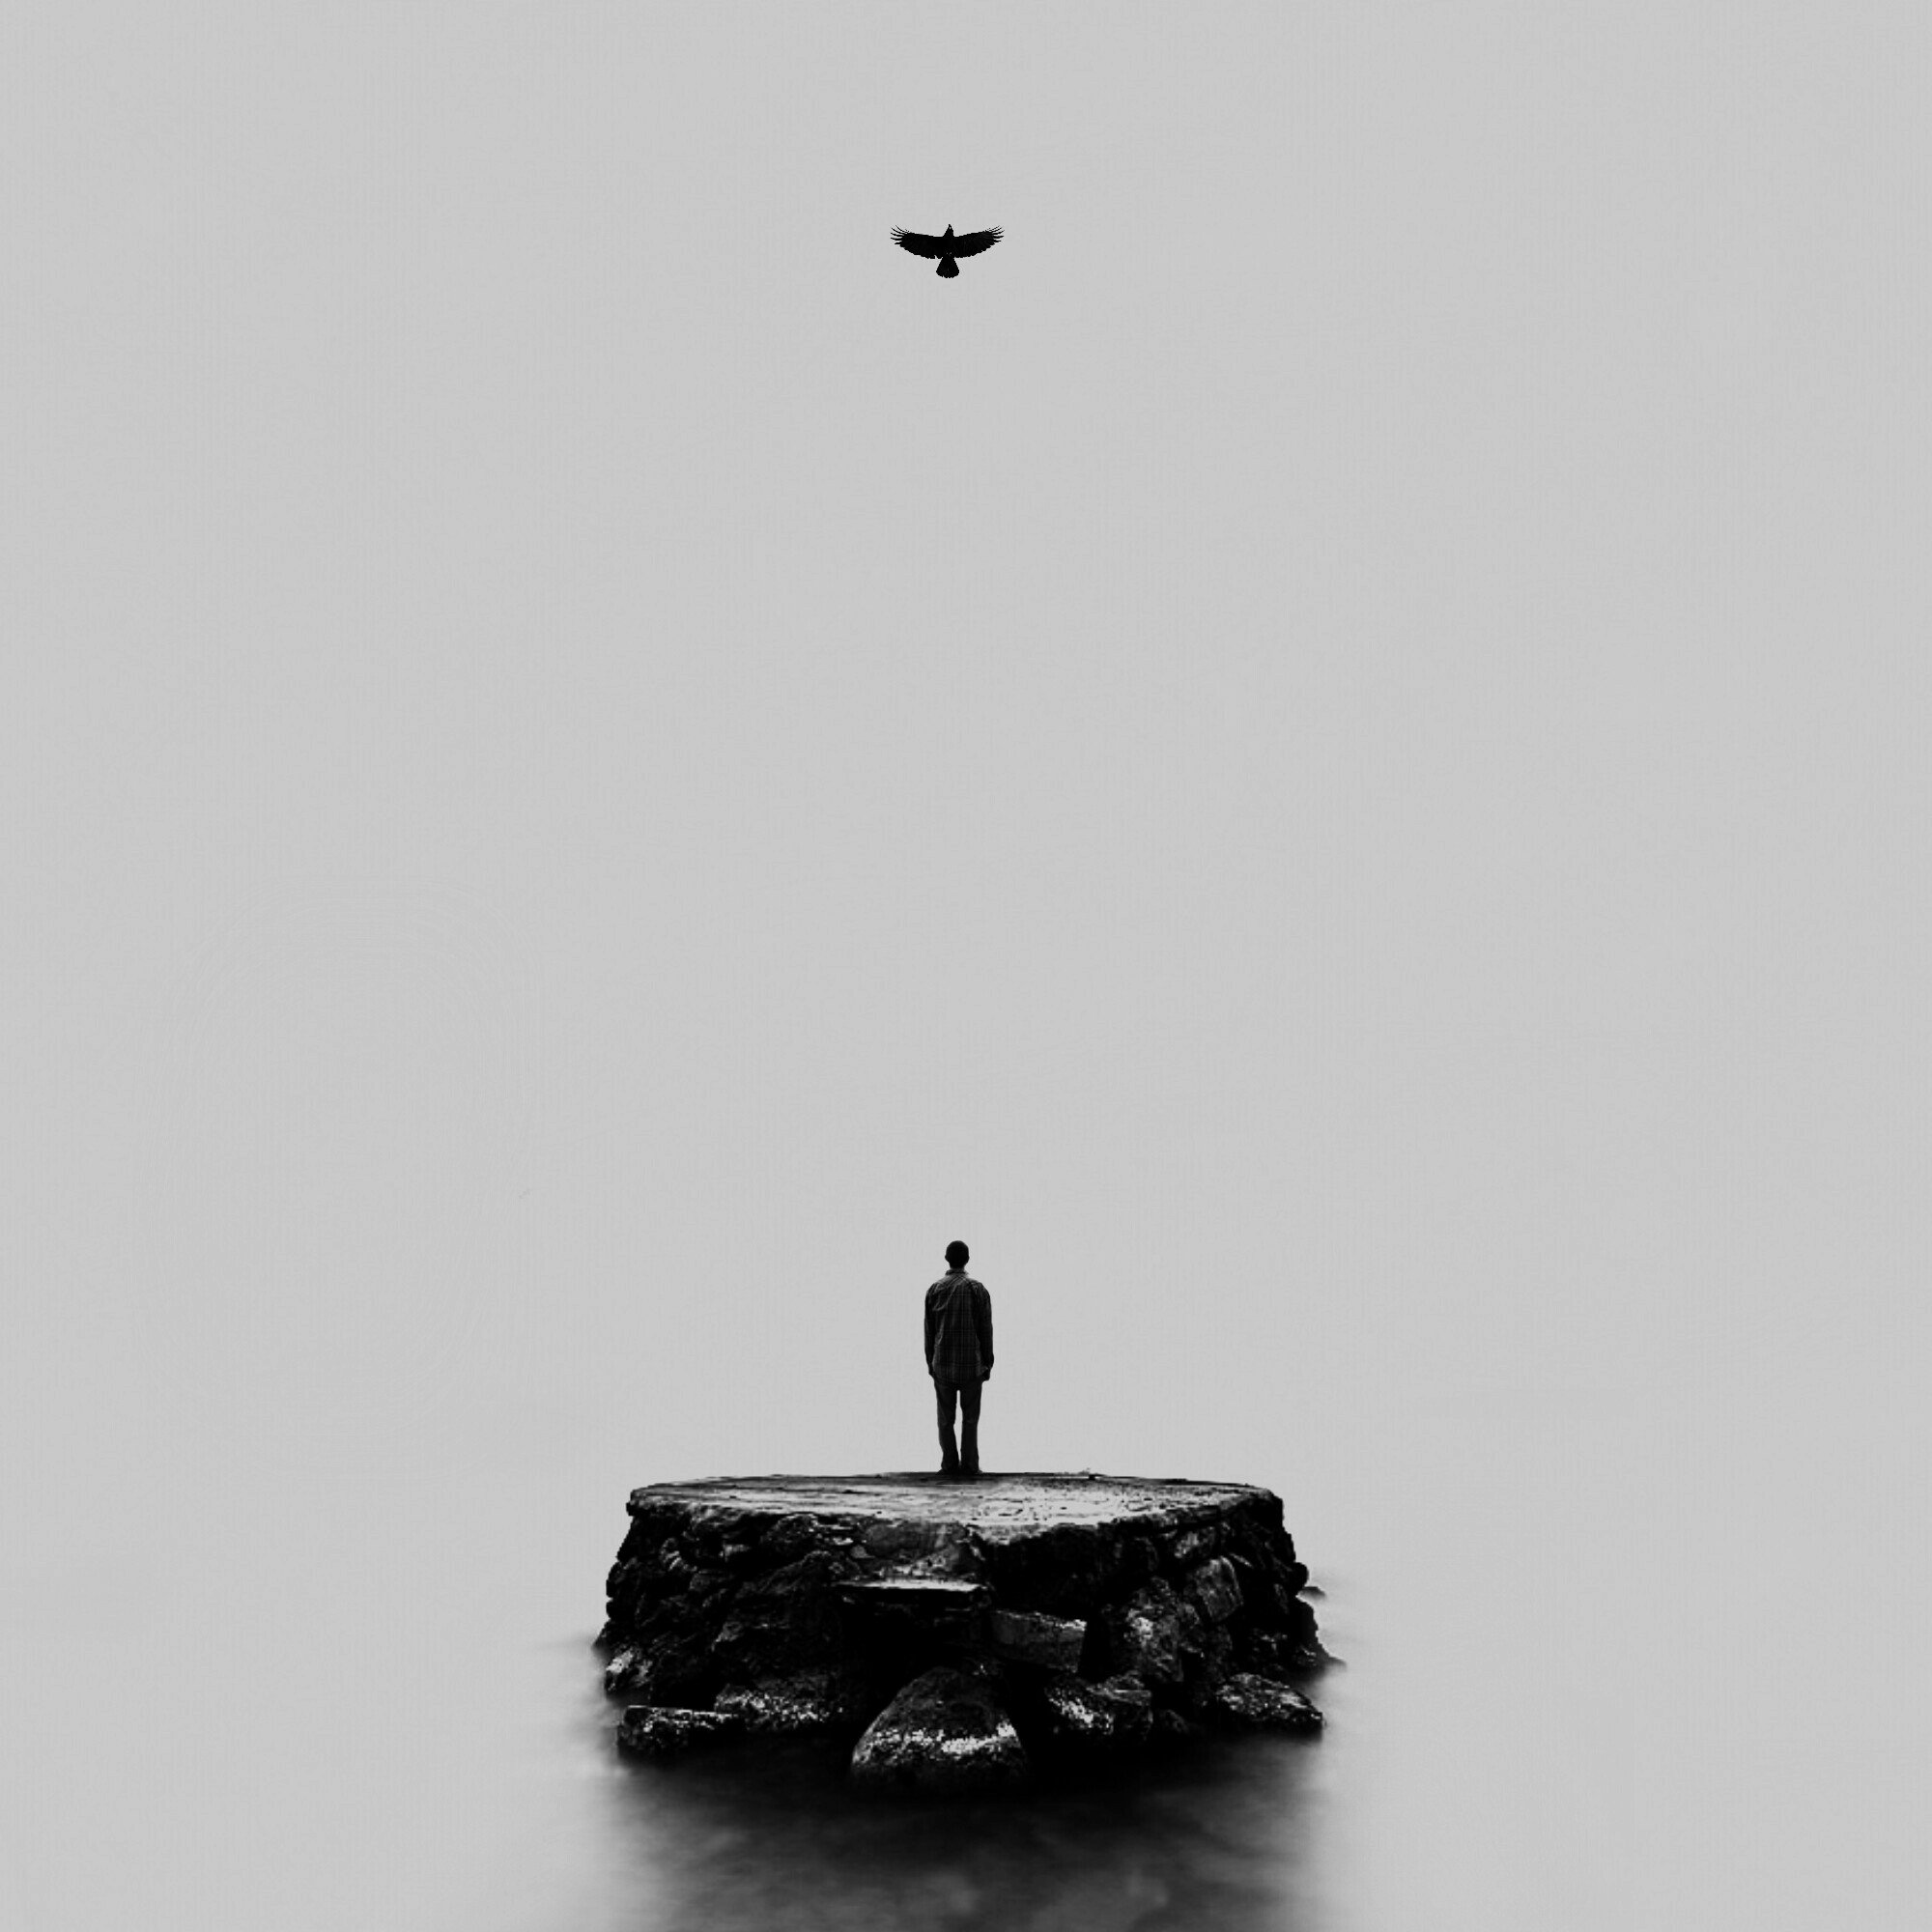 #35photo_ru#surrealart#photoshop #photography#minimalism #conceptual#fineart #instagram#ps_emotion#bnwminimalismmag #harfeaks #ir_photographer#ir_aks #hadimalijani#minimal #canon#blackandwhite#bnw#surreal#conceptualart#art #سورئالیسم#فاین_آرت#ادیت#فتوشاپ , Hadi Malijani